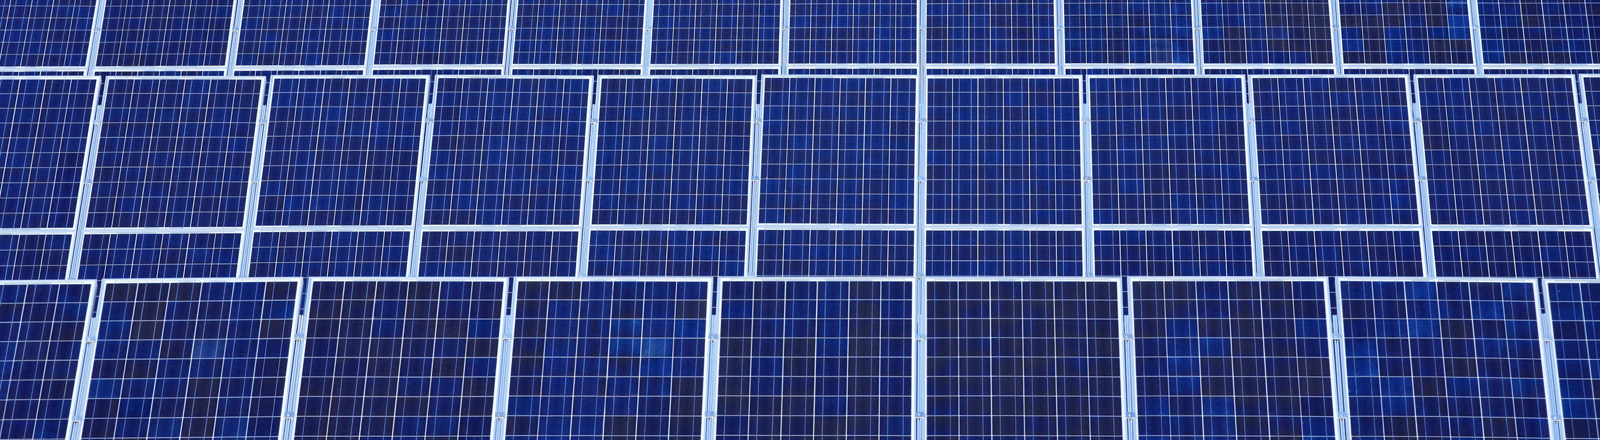 Solarkraftwerk, endlose Solarpaneele, Symbolbild